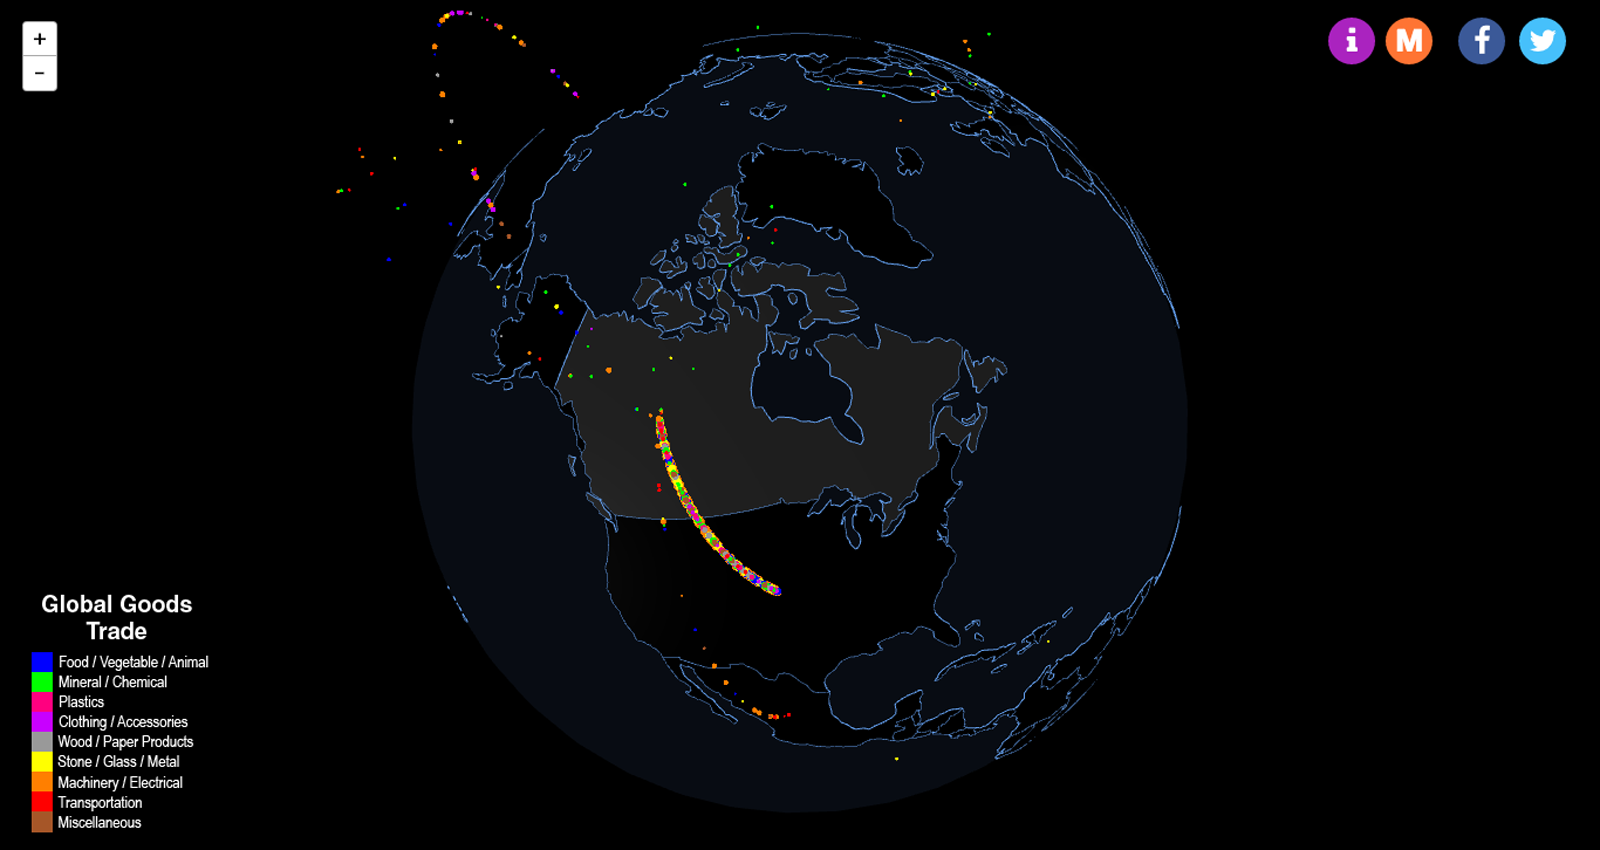 Canada's trade in 2015